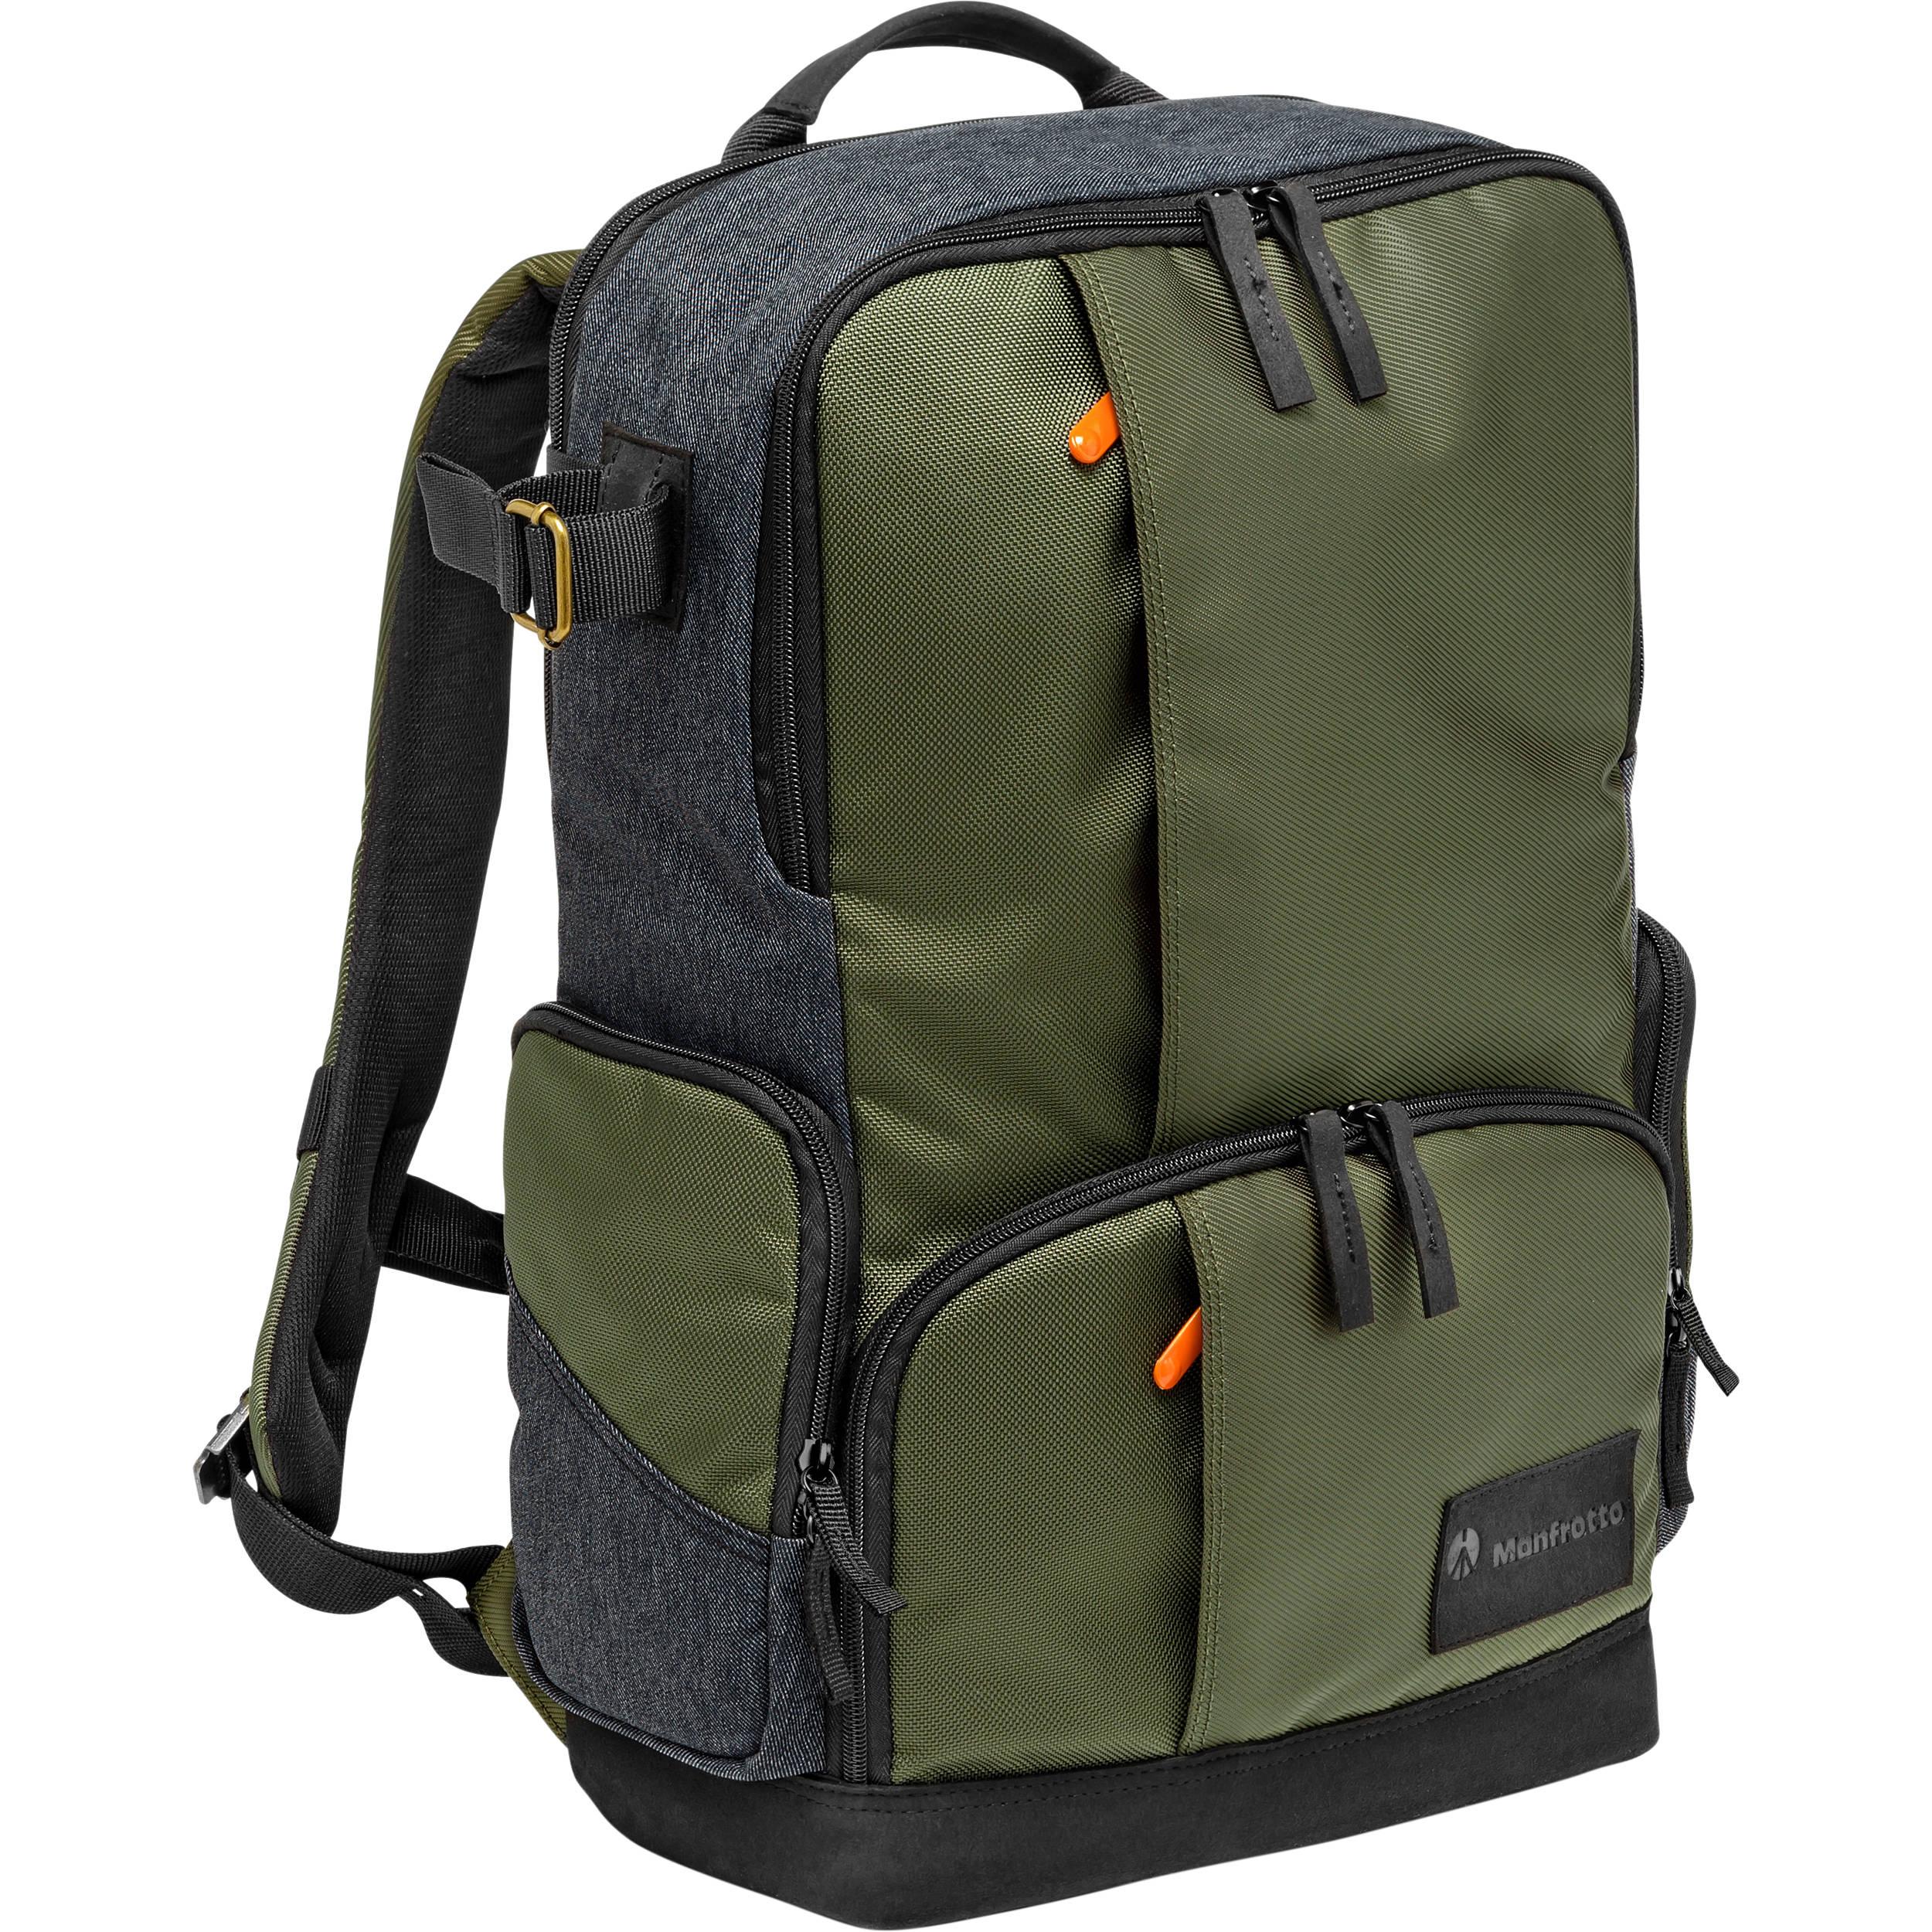 Manfrotto Street Medium Backpack MB MS-BP-IGR B&H Photo Video